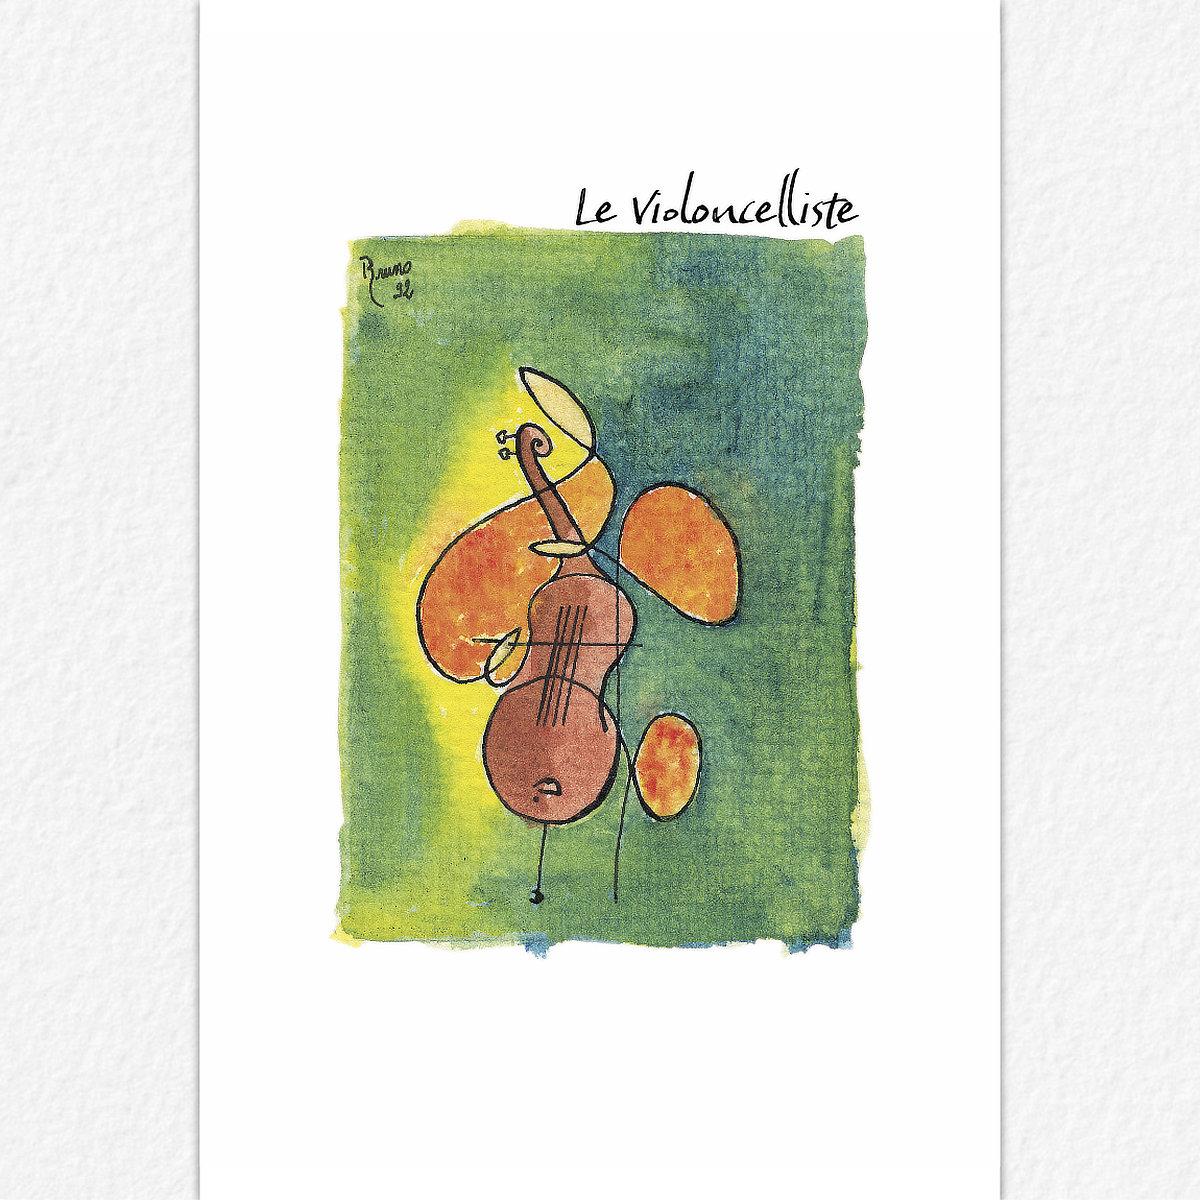 Le Violoncelliste - carte postale